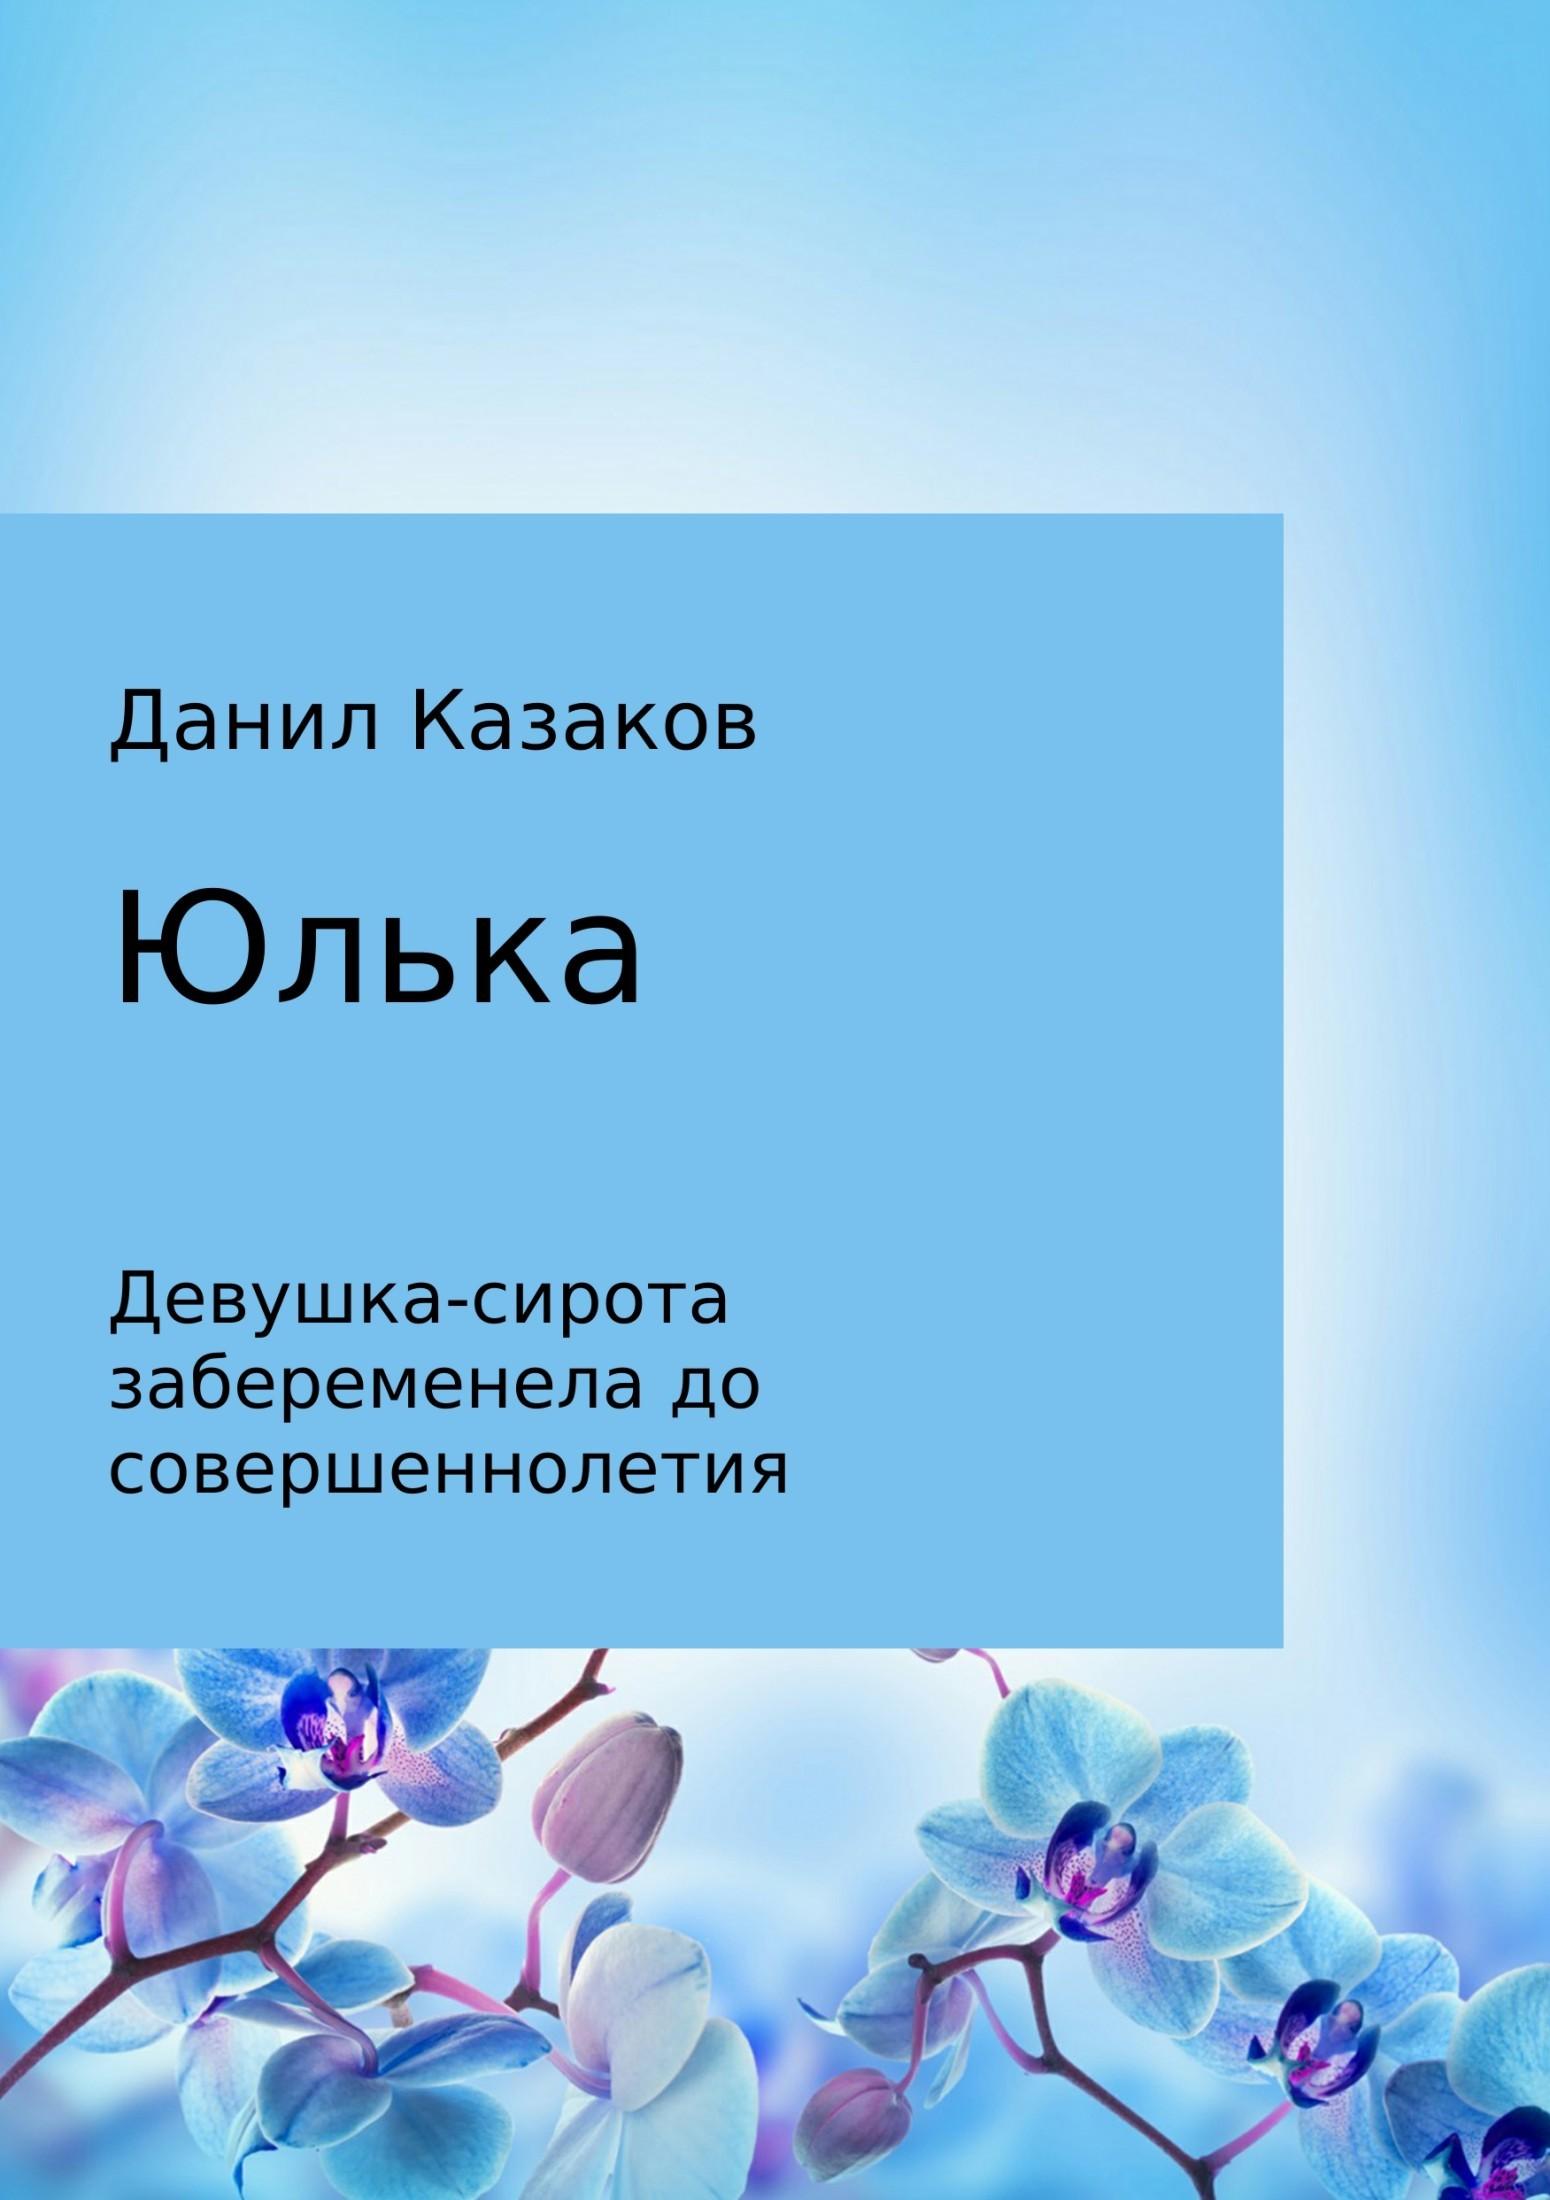 Данил Васильевич Казаков Юлька данил васильевич казаков монтекки и капулетти